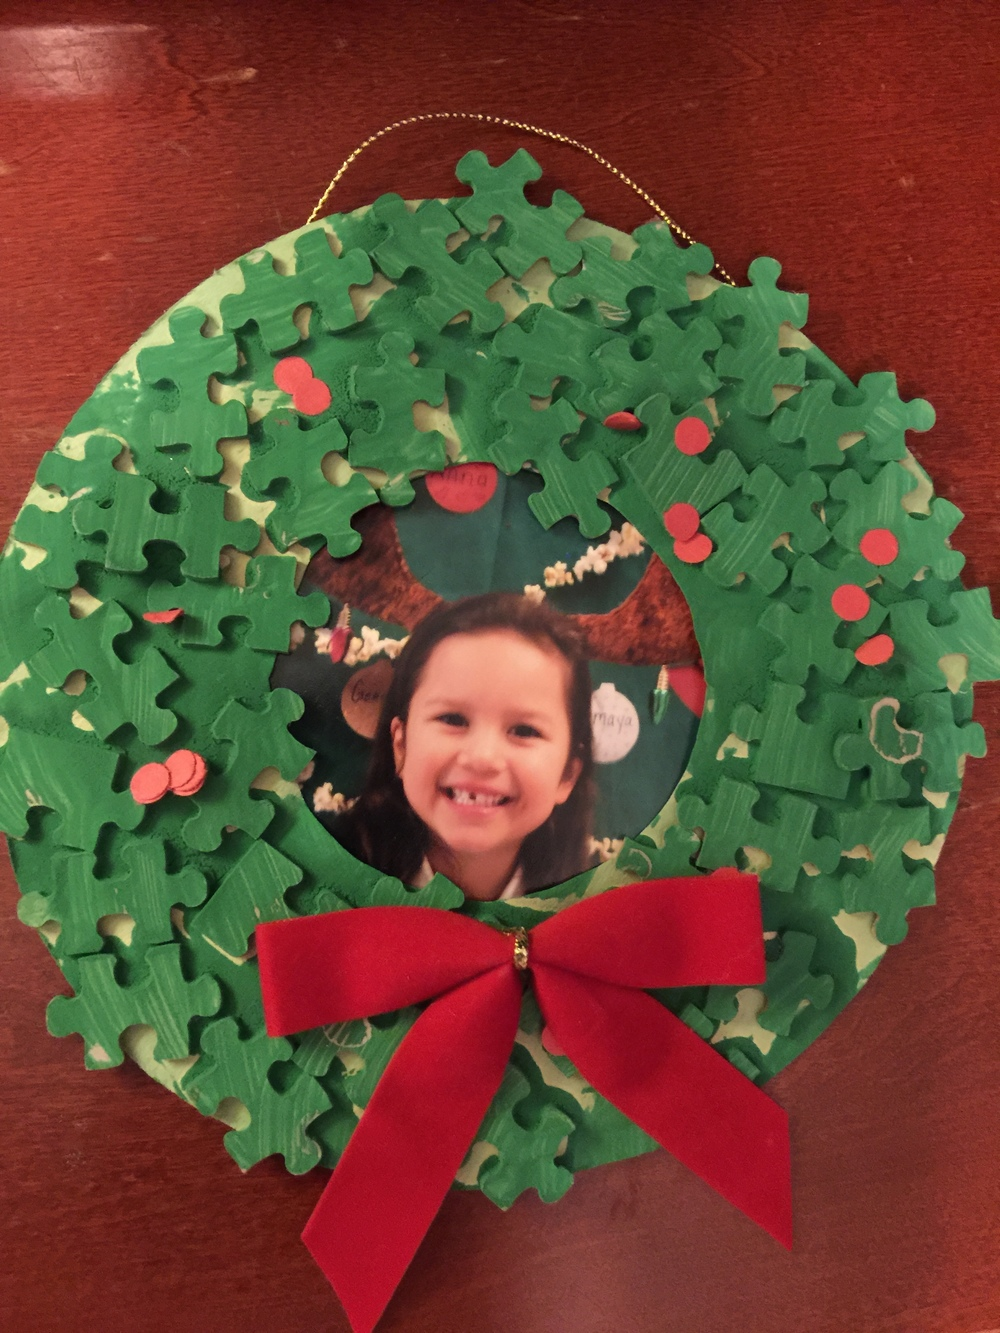 Genesis Garner's kindergarten Christmas ornament.